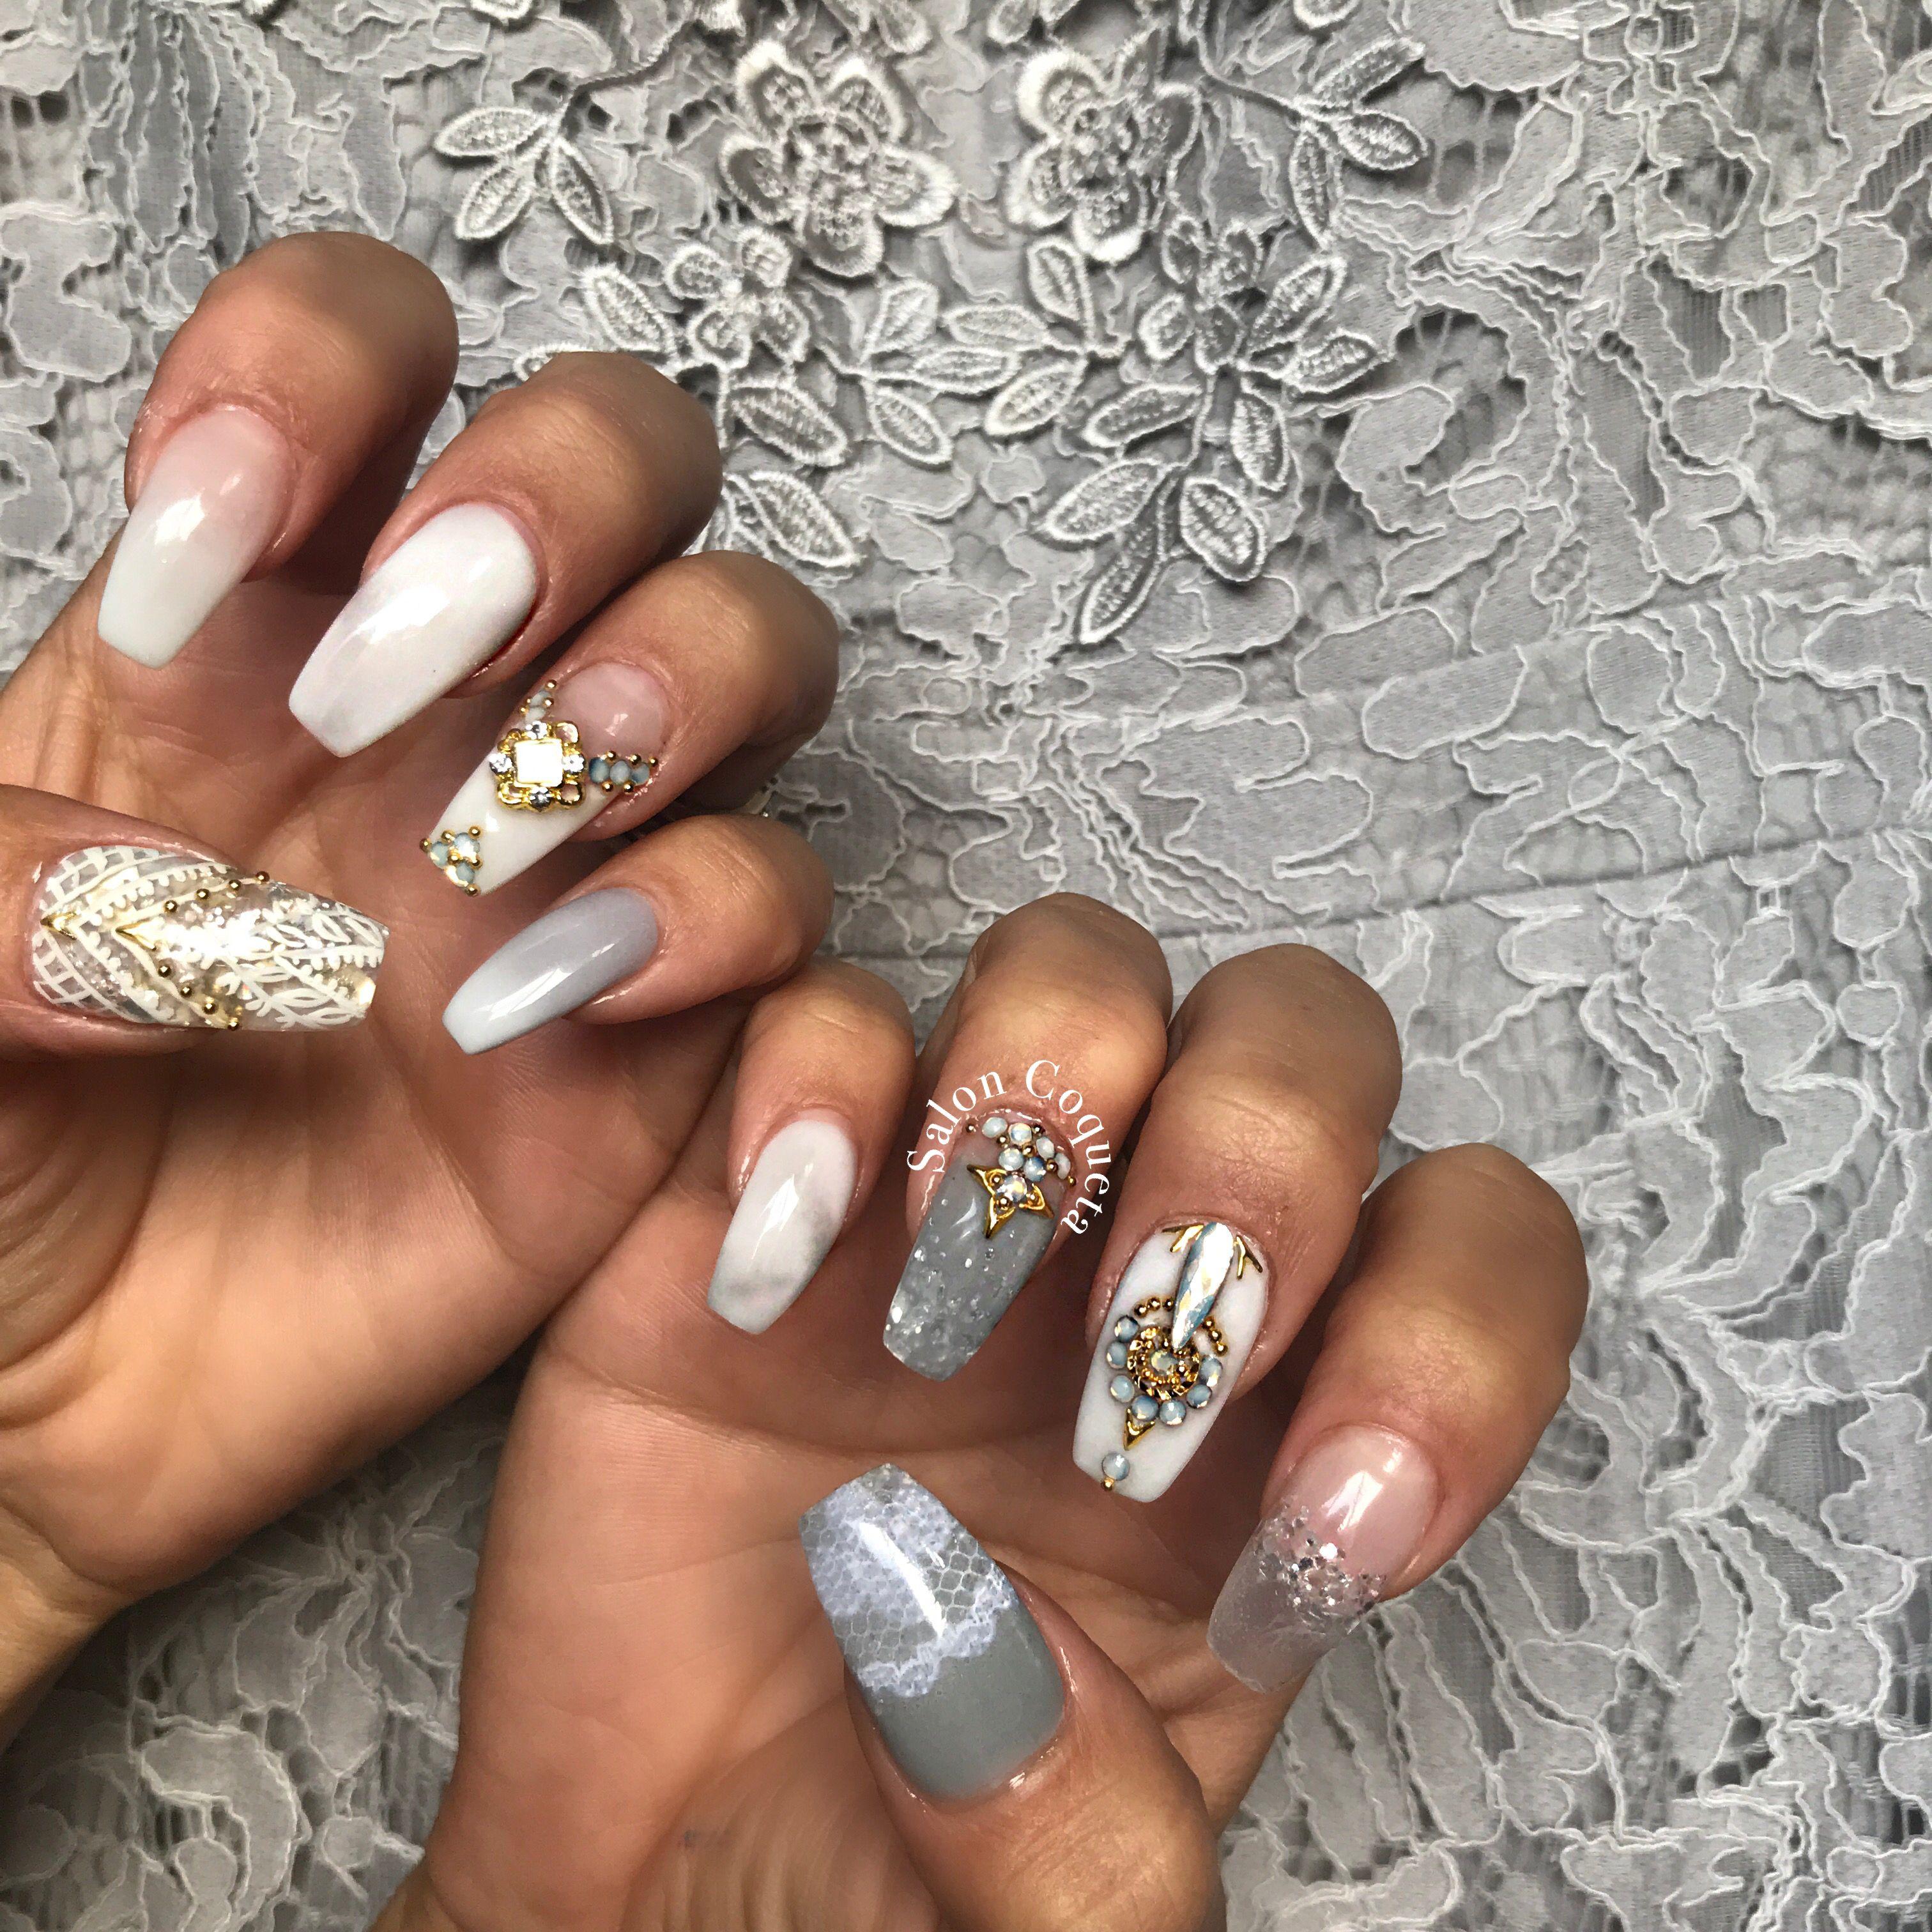 Nails Nail White marble gold diamond Design nailart coffin Shape ...